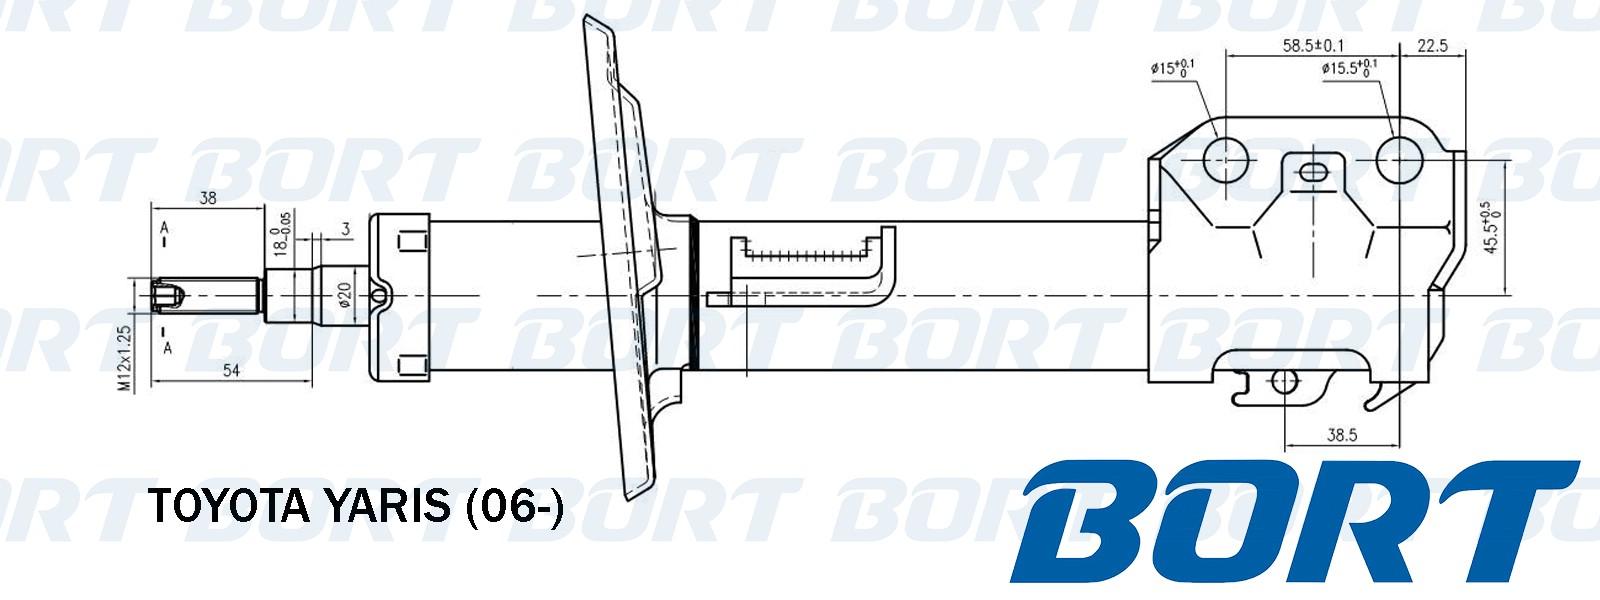 Стойка амортизационная газомасляная передняя левая. BORT (B339065)